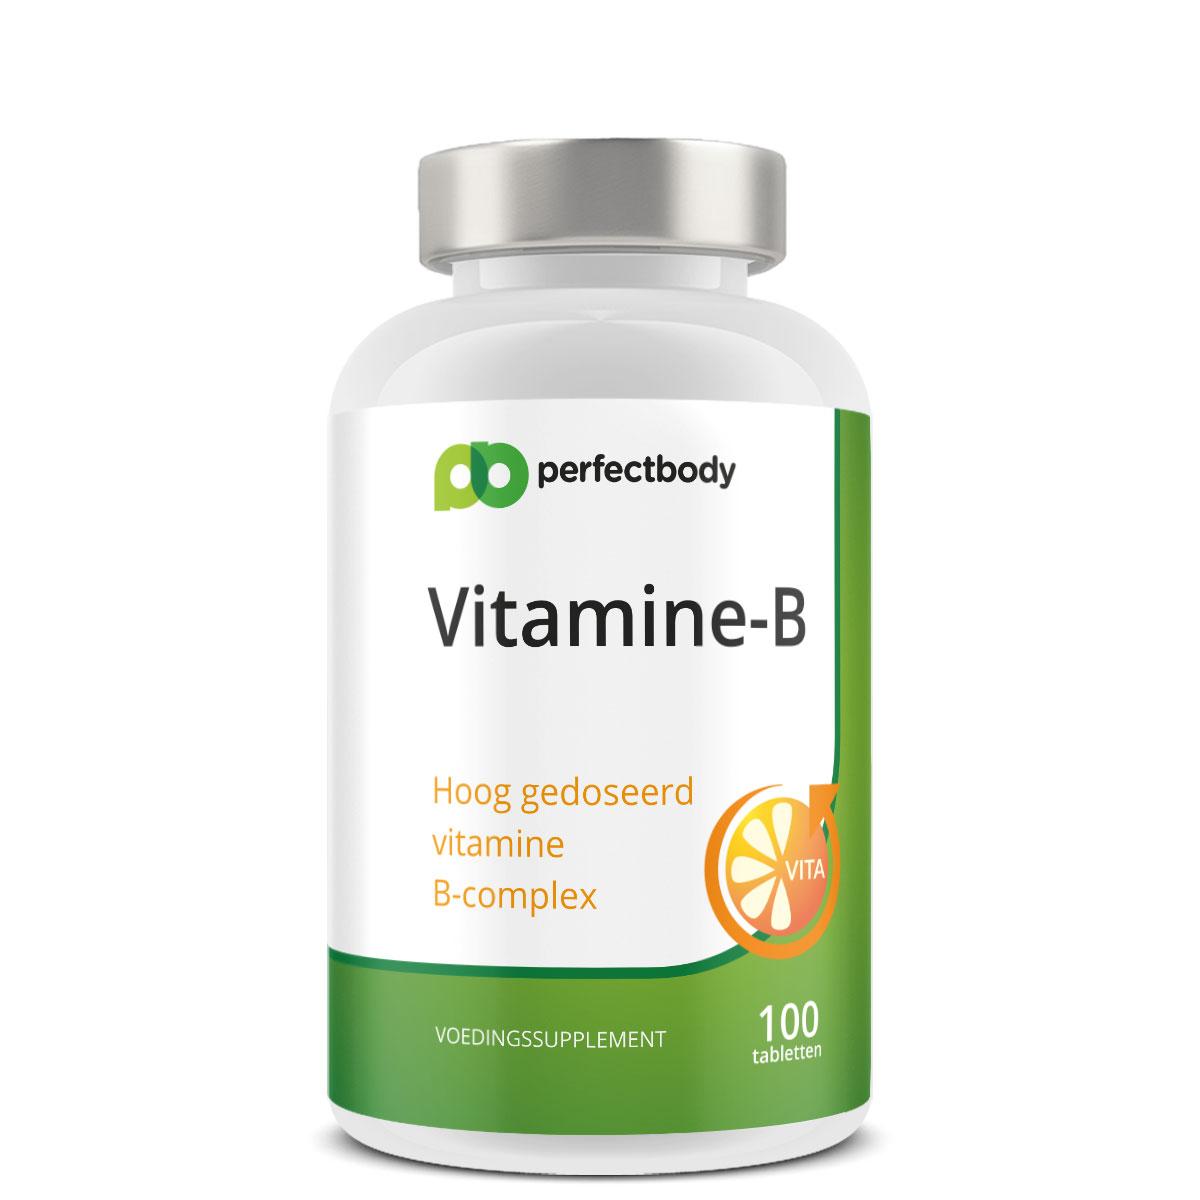 Perfectbody Vitamine B Tabletten - 100 Tabletten